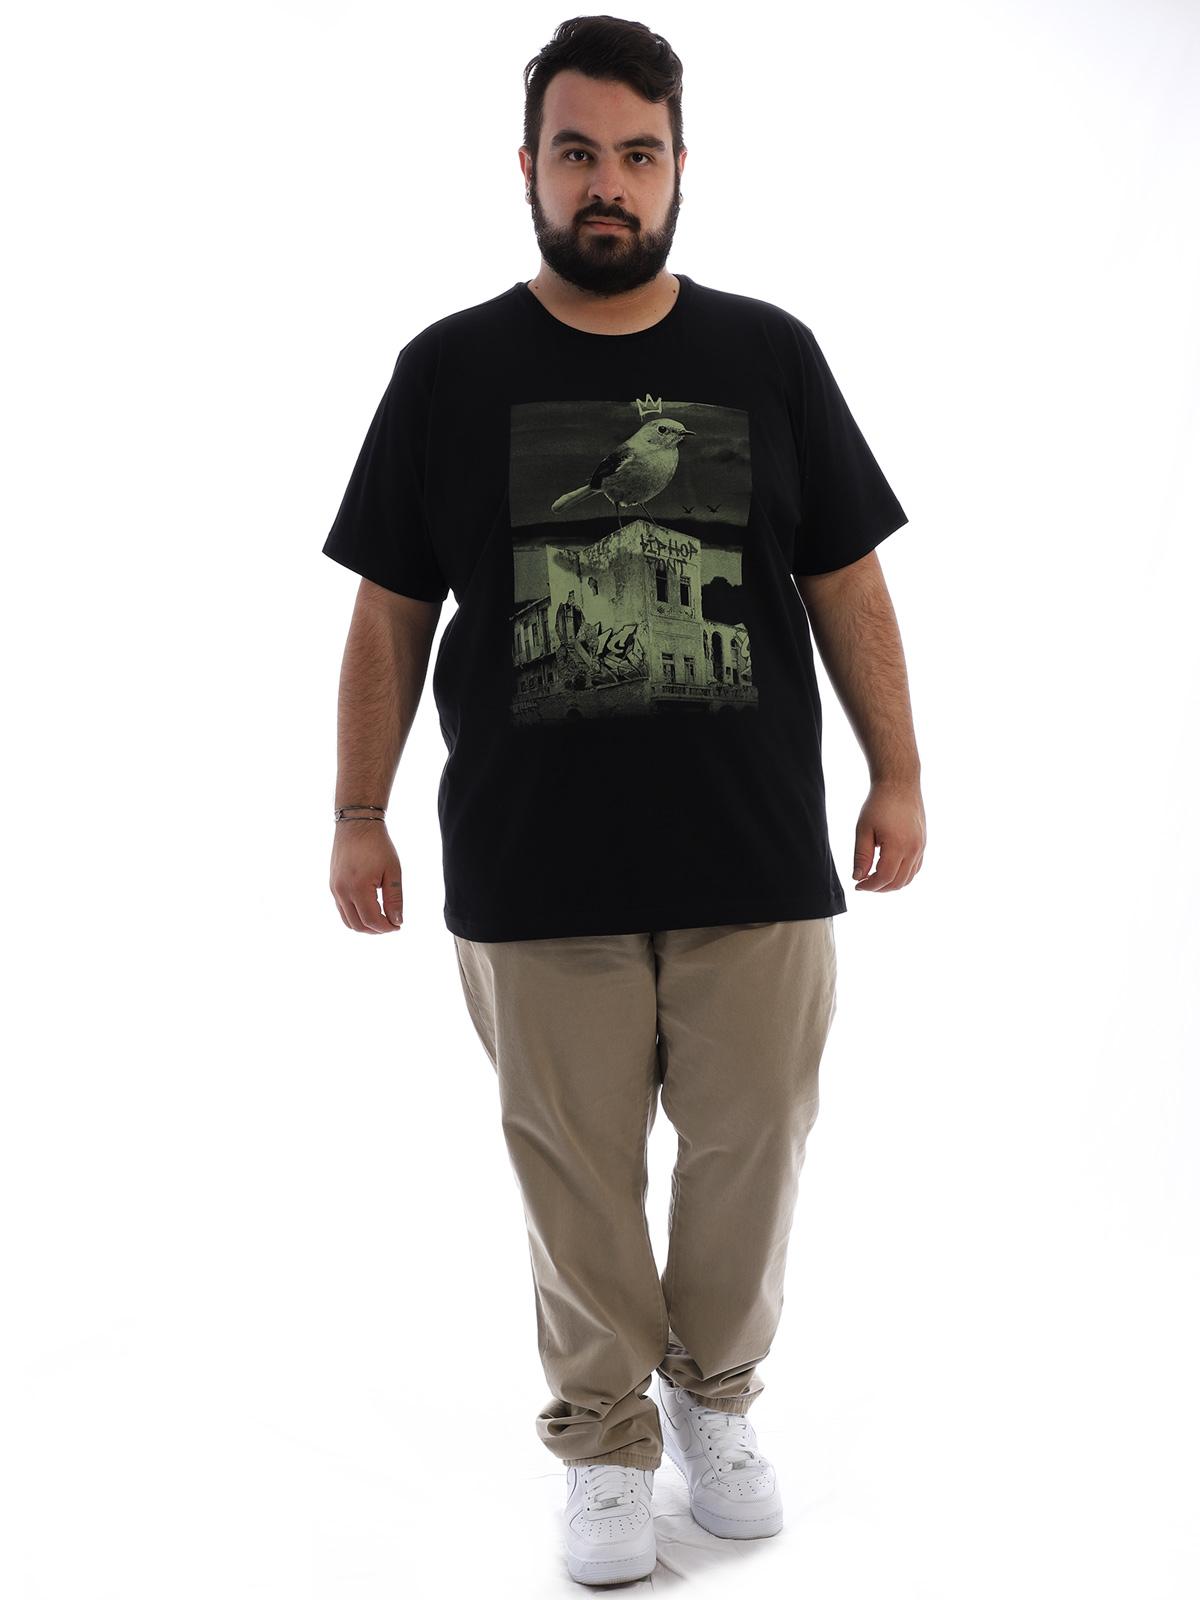 Camiseta Plus Size Masculina Algodão Passarinho Preto